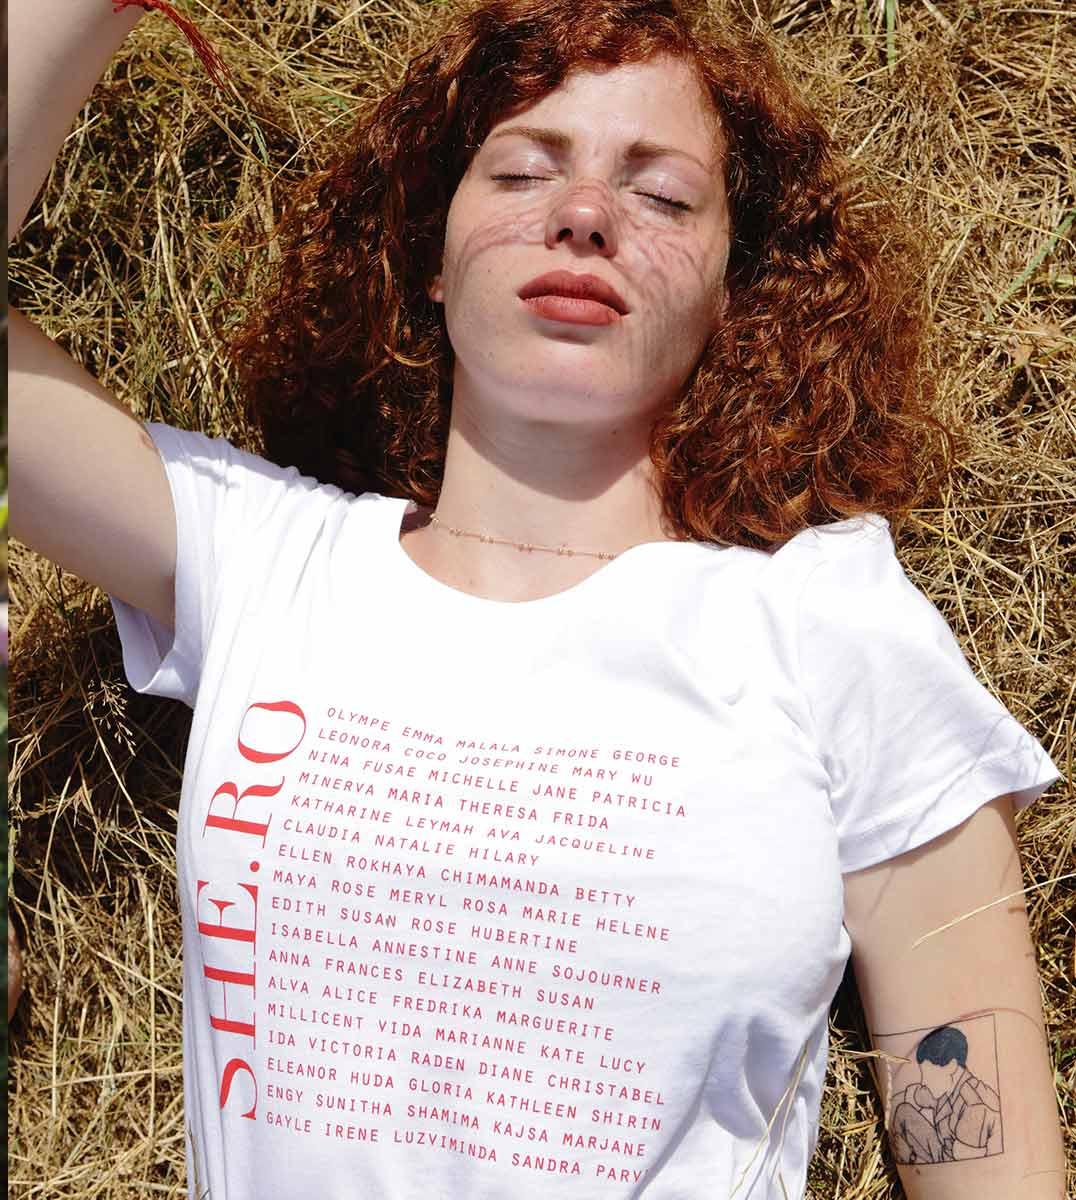 femme allongée dans l'herbe portant le t-shirt shero blanc